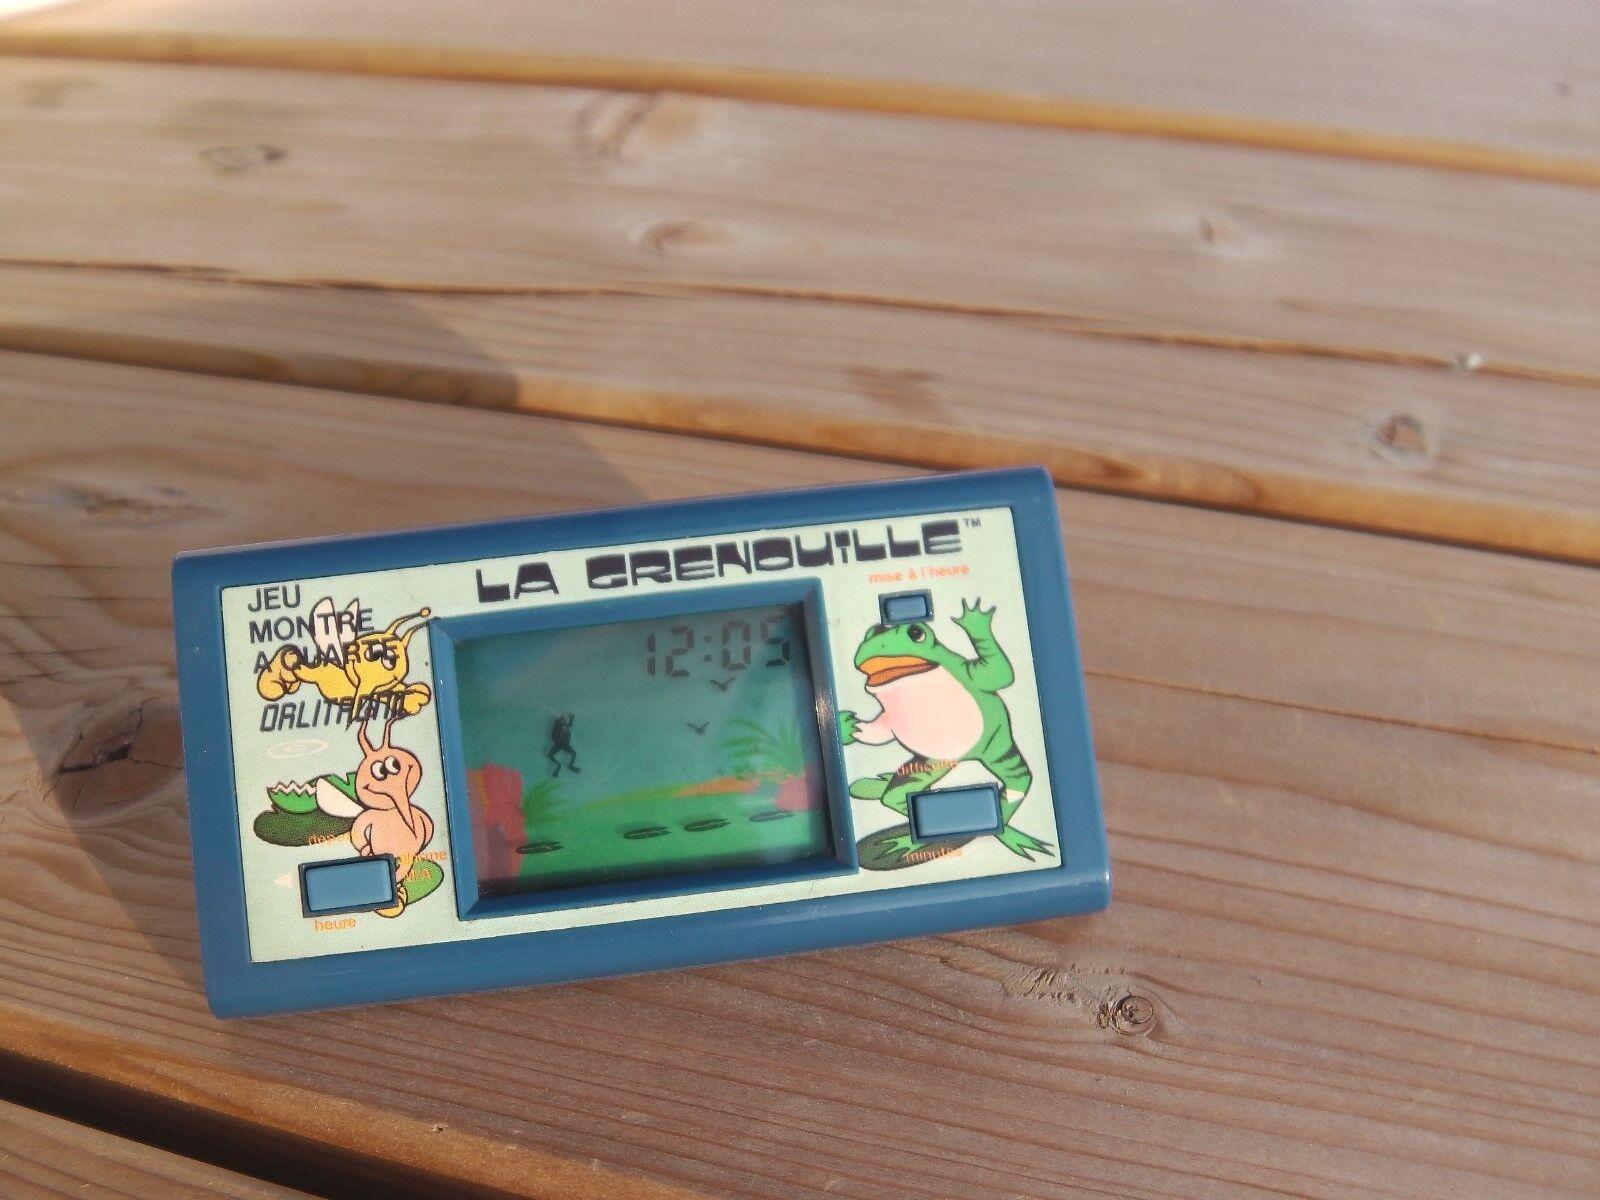 Lcd game pocket Orlitronic Tiger   La grenouille   1984 game watch